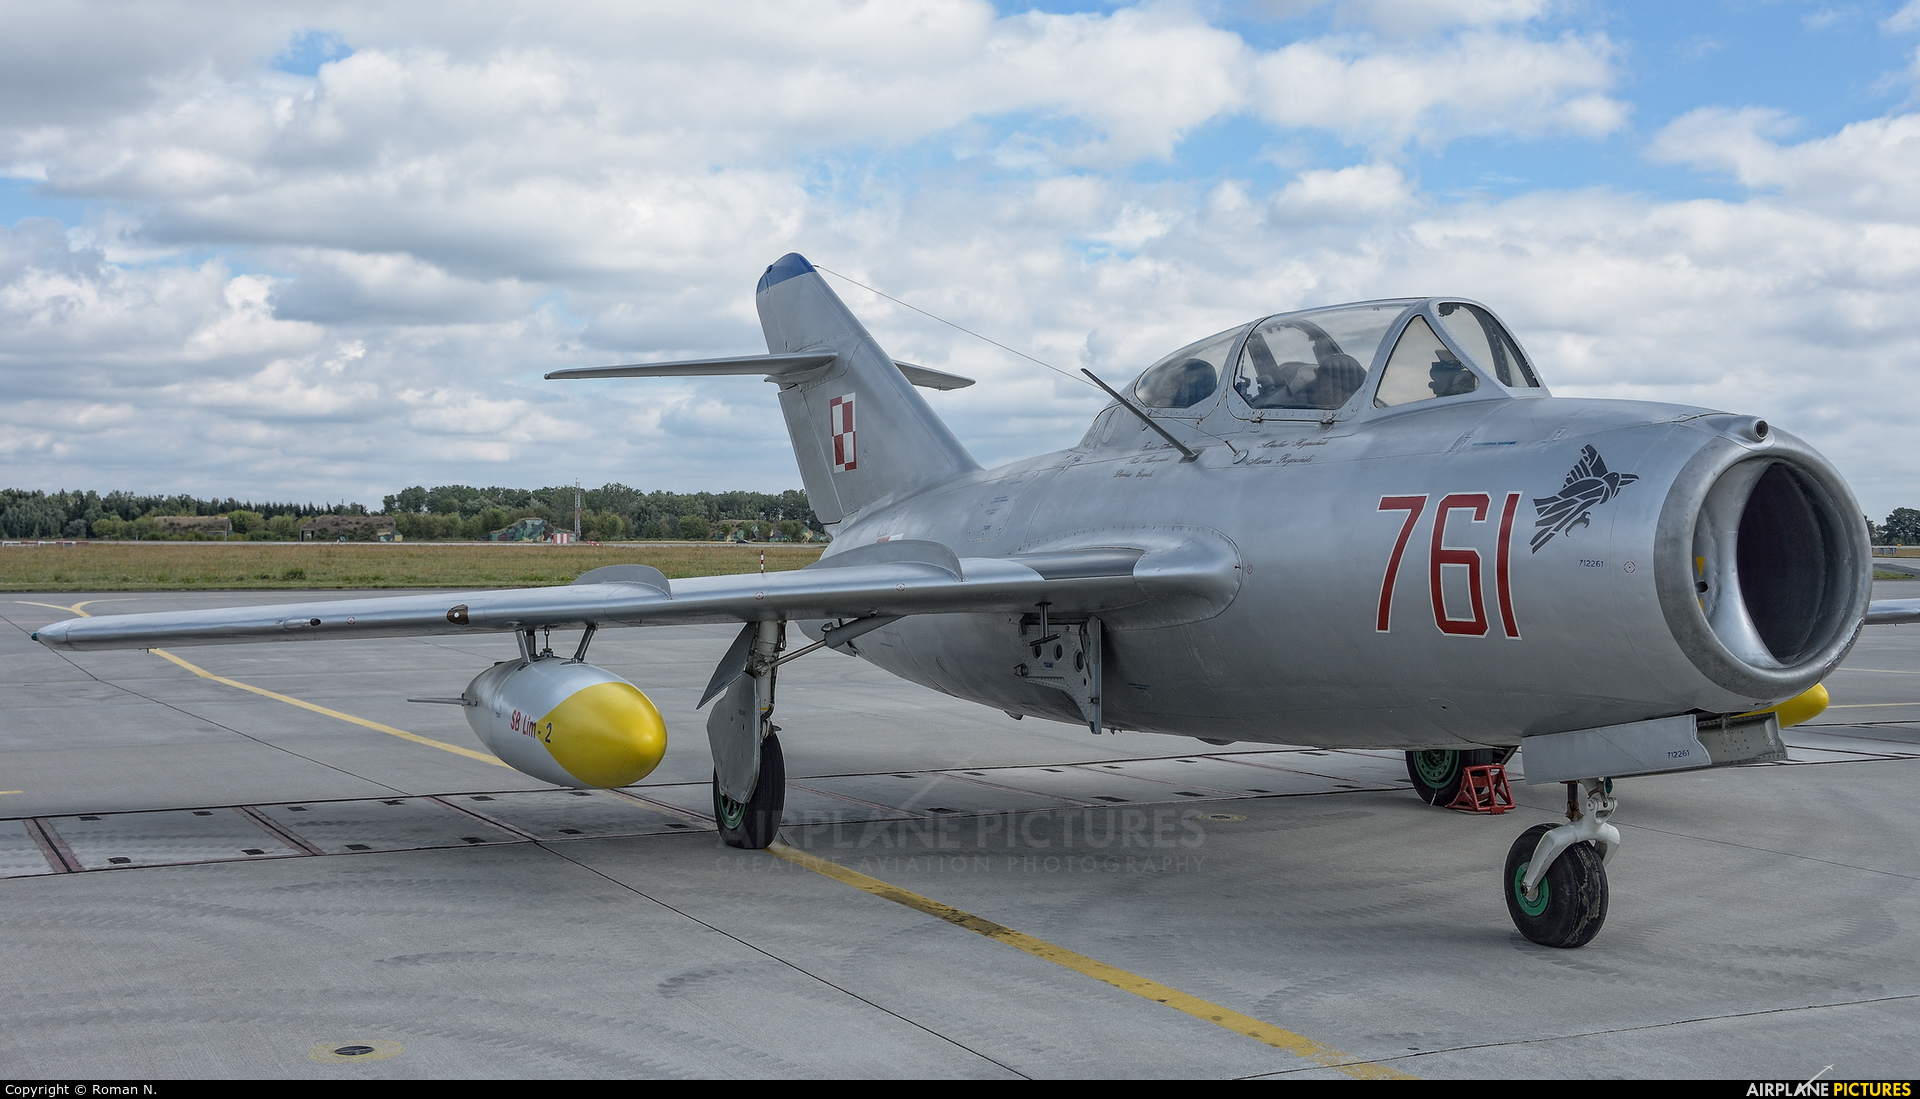 Poland - Air Force 761 aircraft at Poznań - Krzesiny